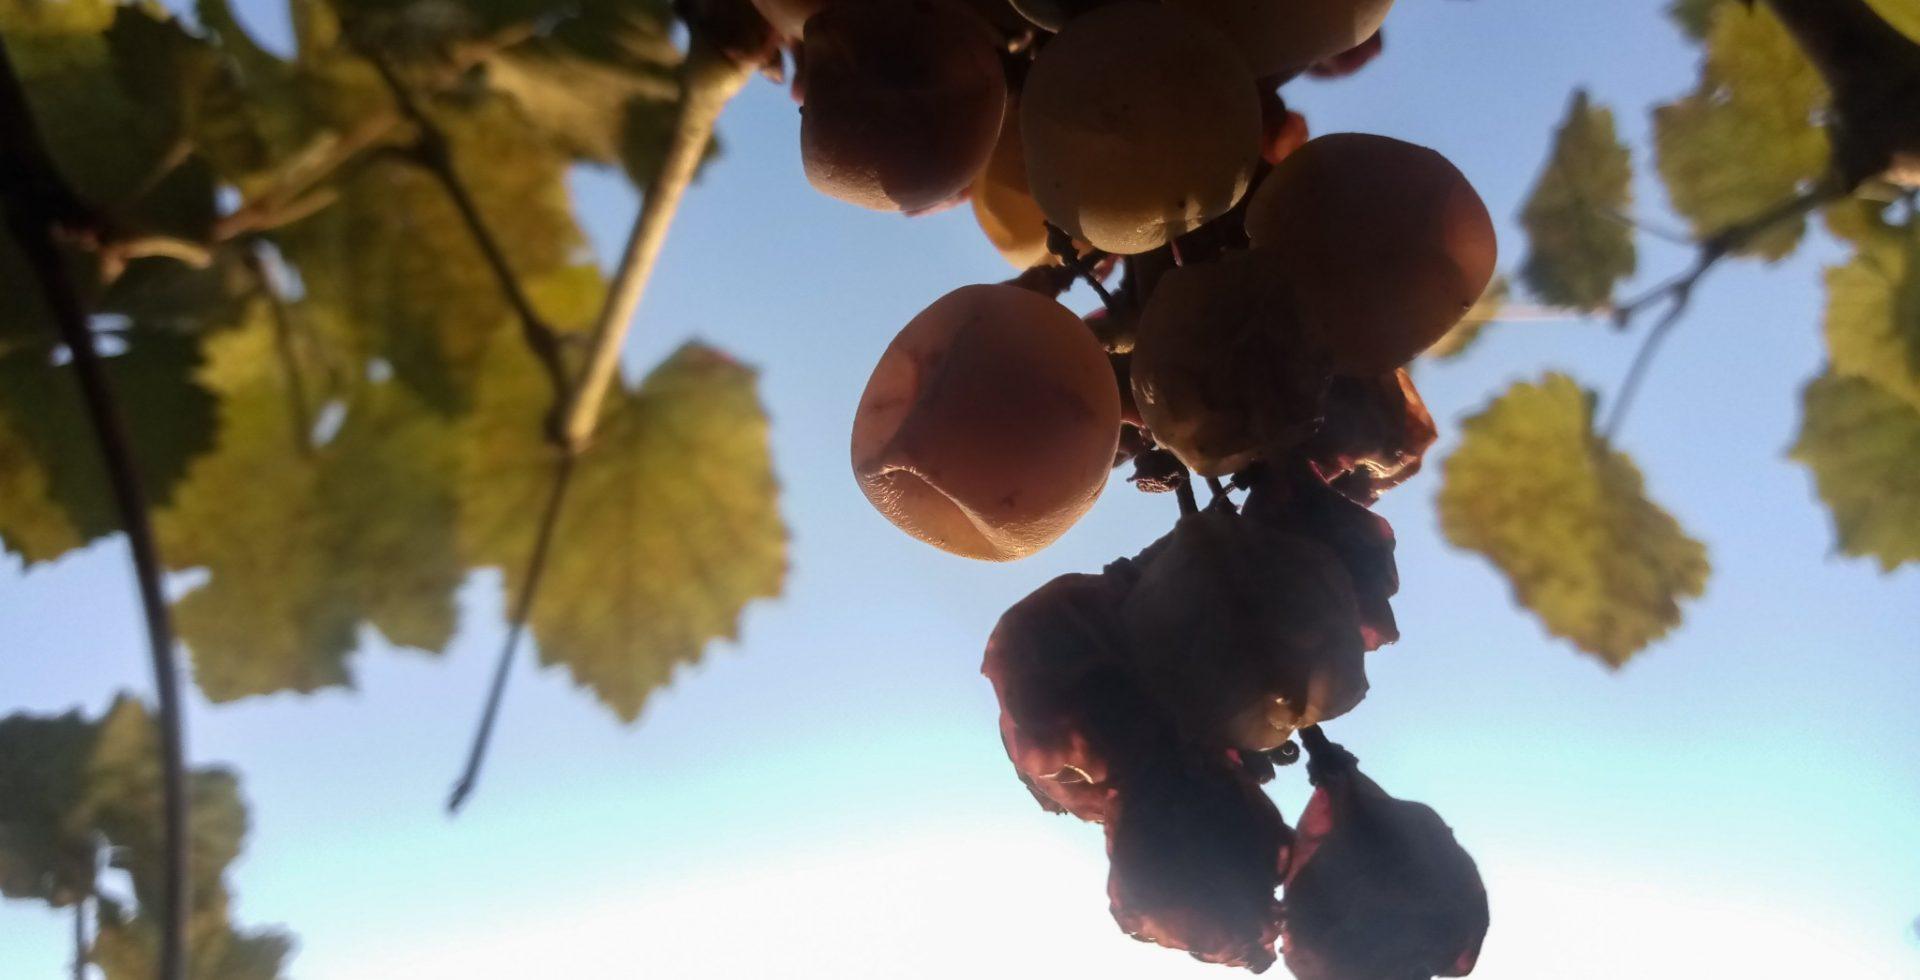 Amazing grape photos